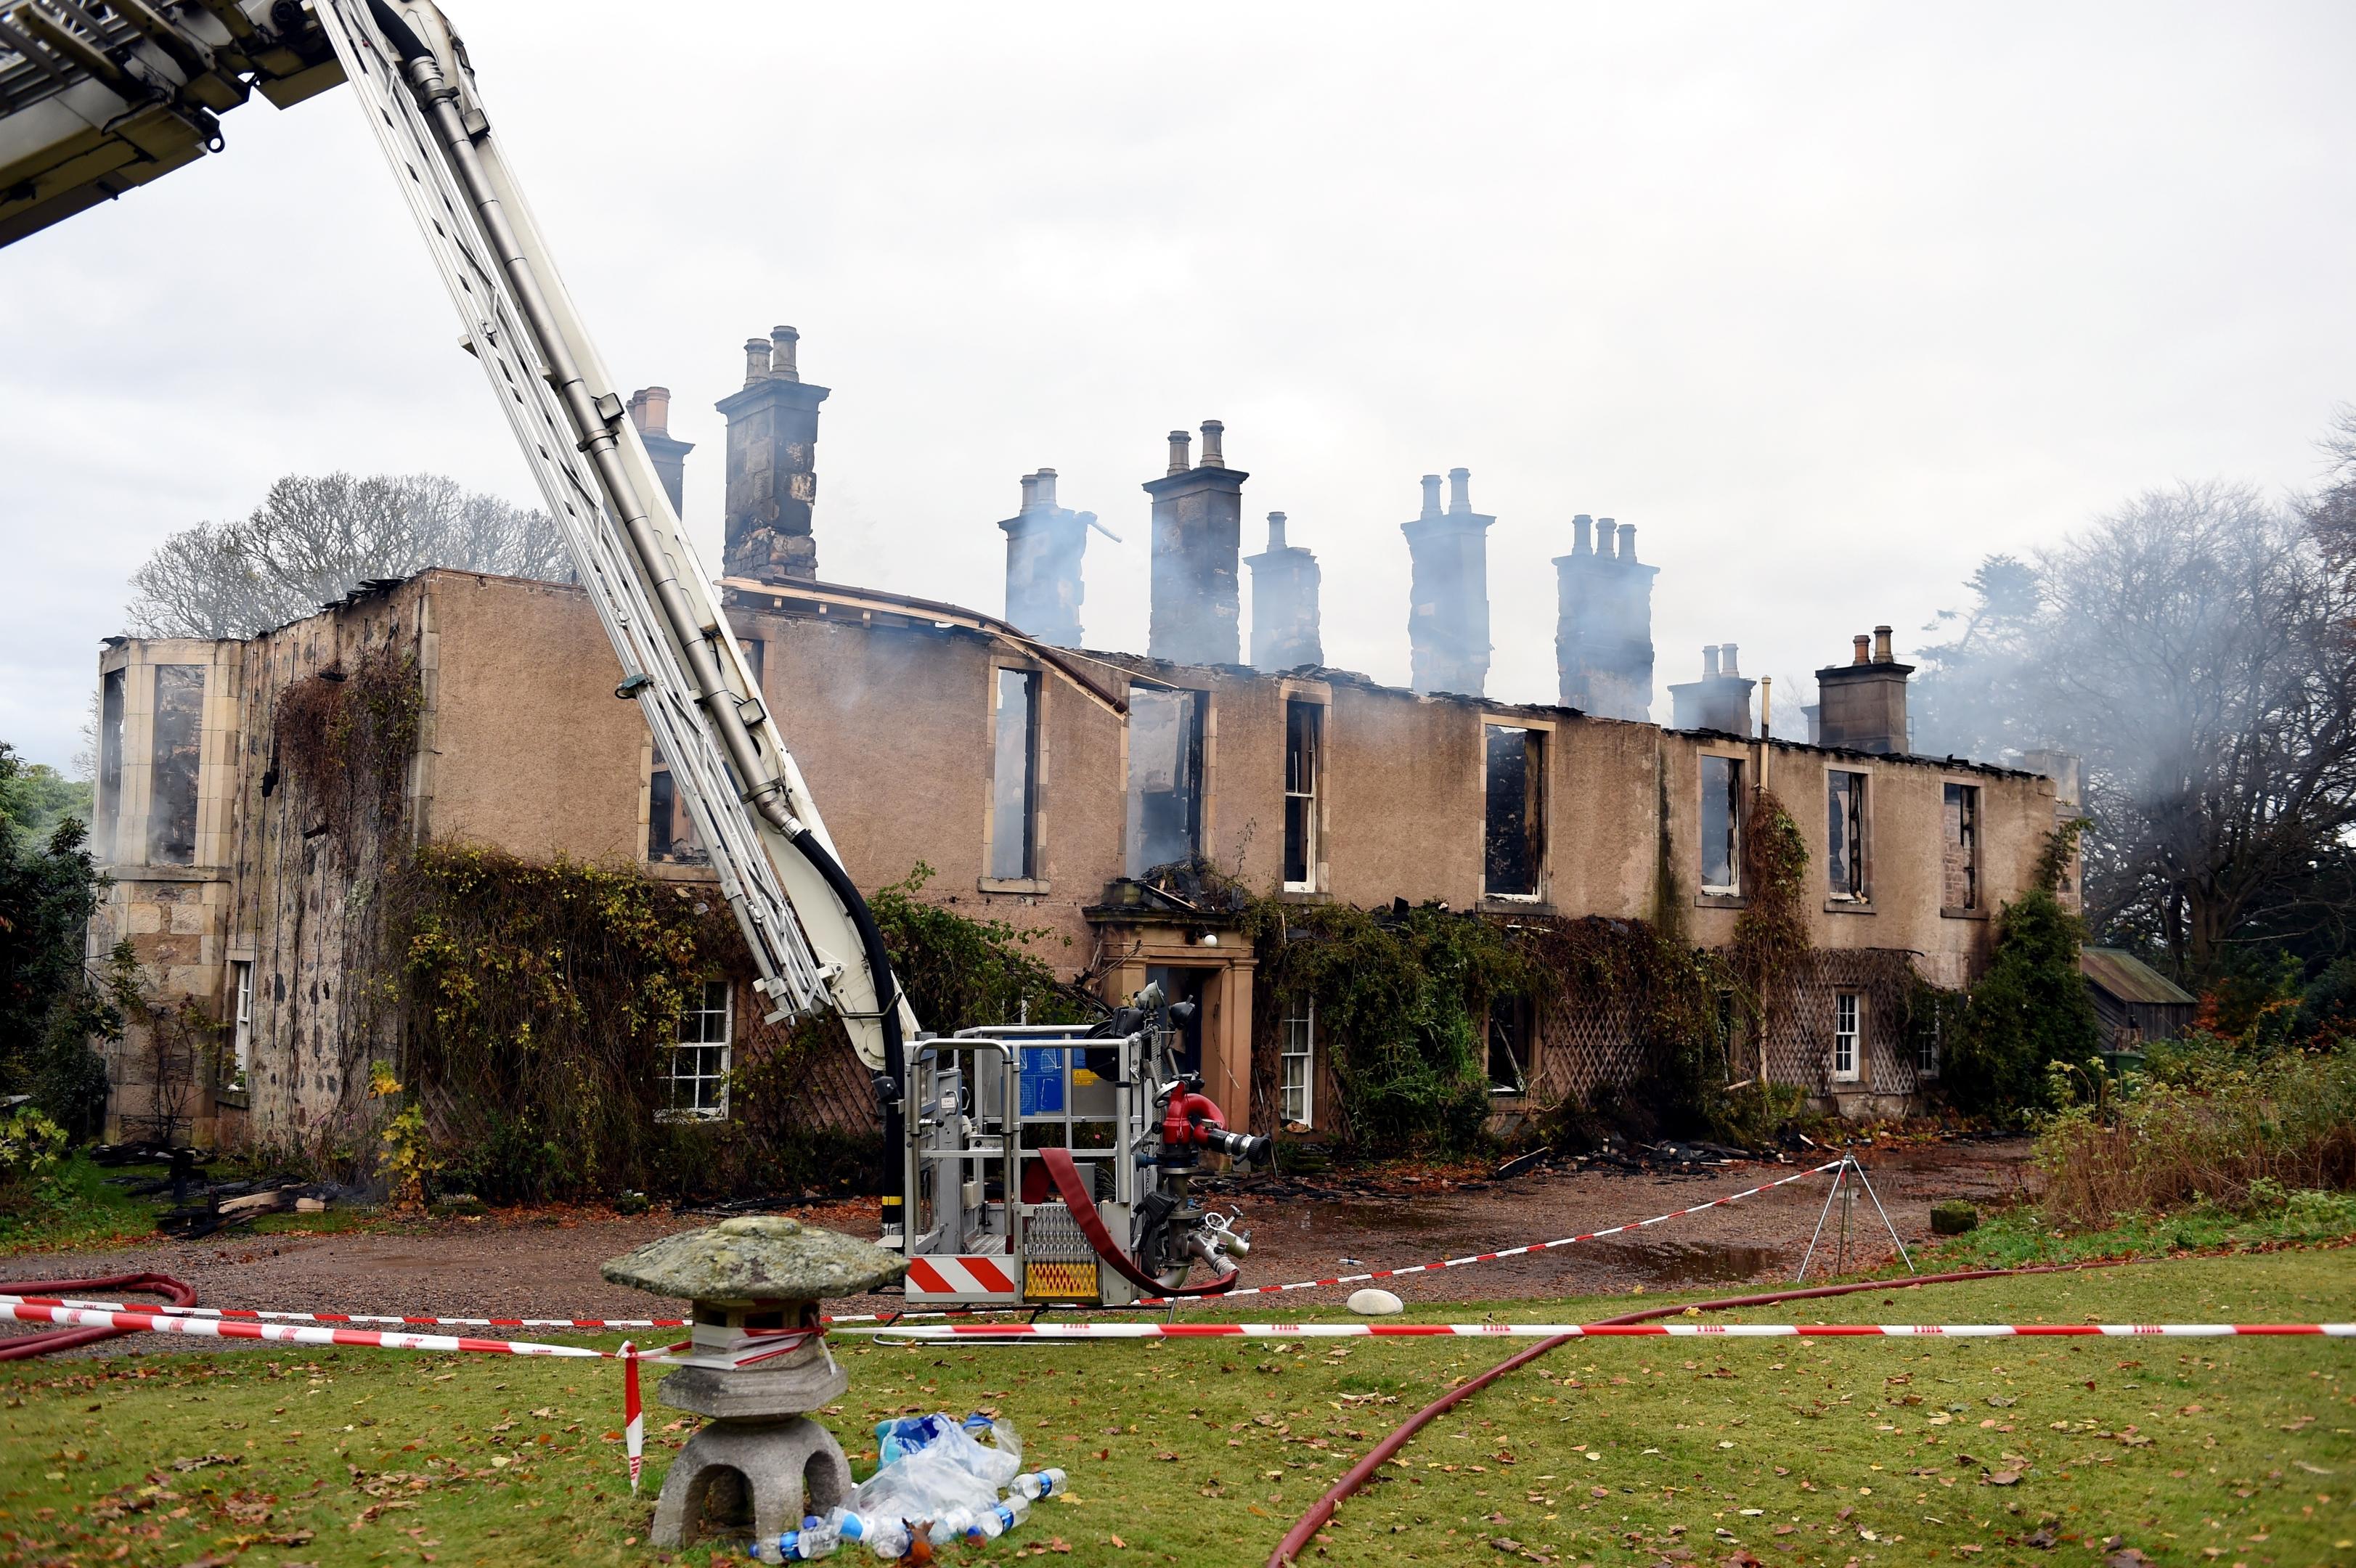 Blackhills House, near Elgin, following a major fire. Pictures by Gordon Lennox